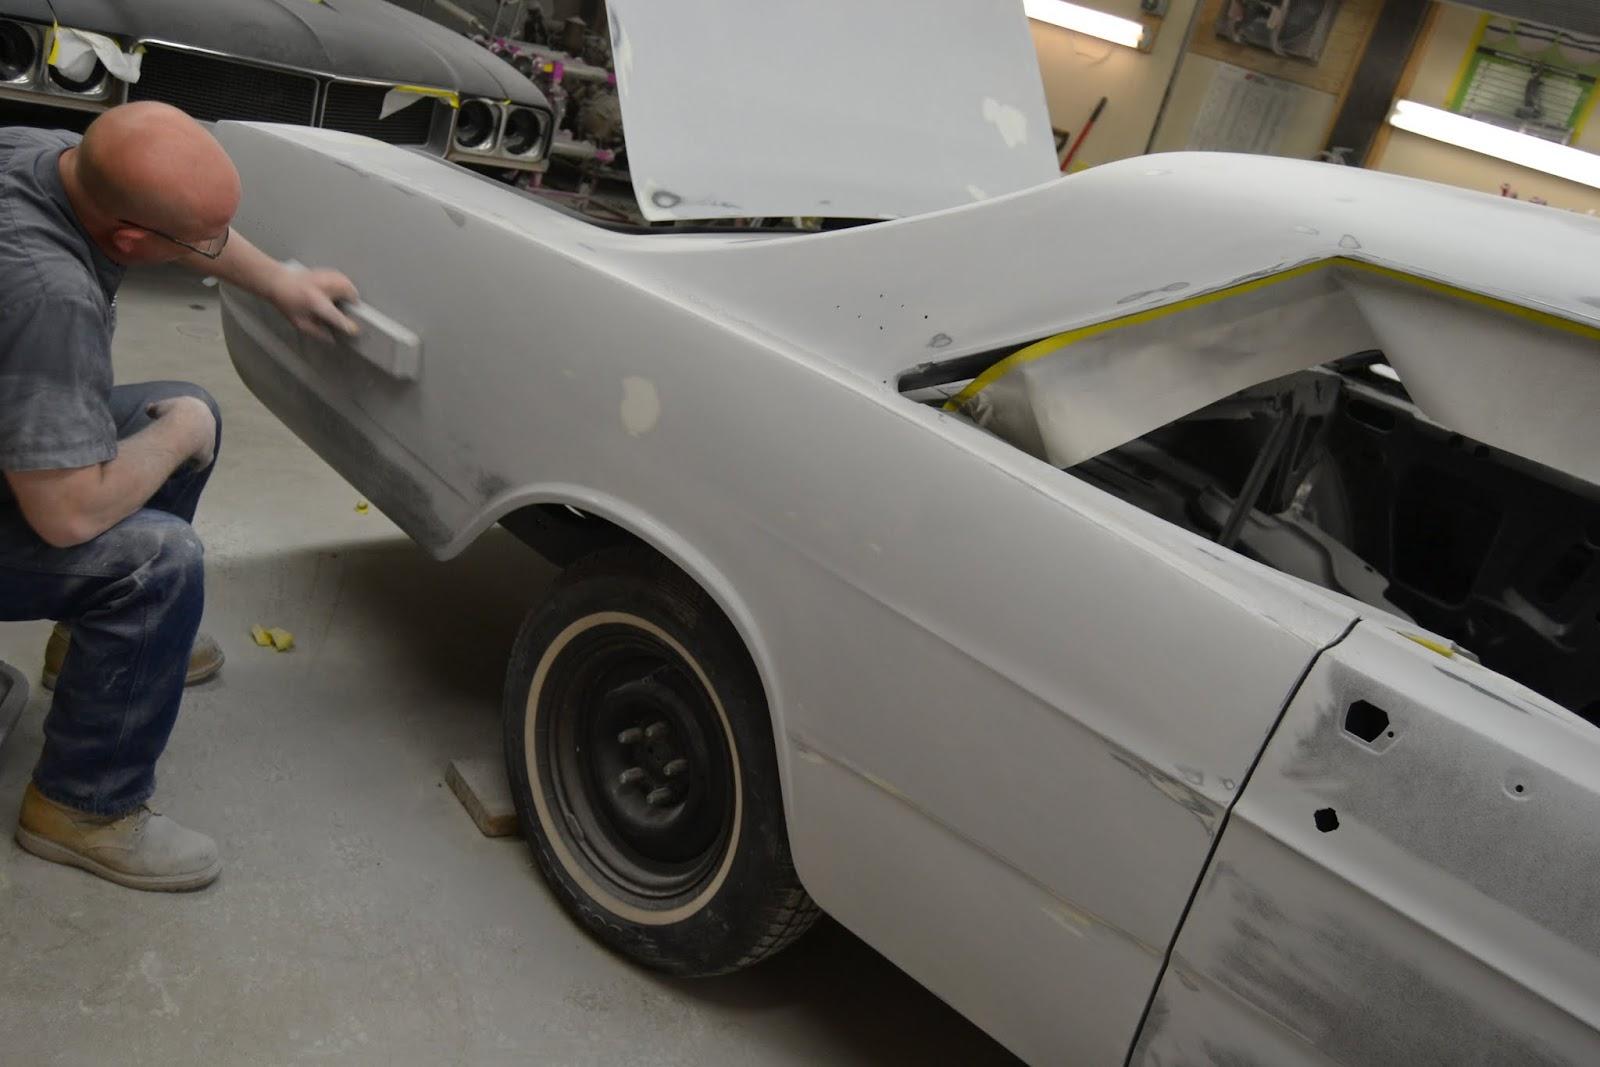 1966_Ford_7L_GT_10-19-15_0521.JPG